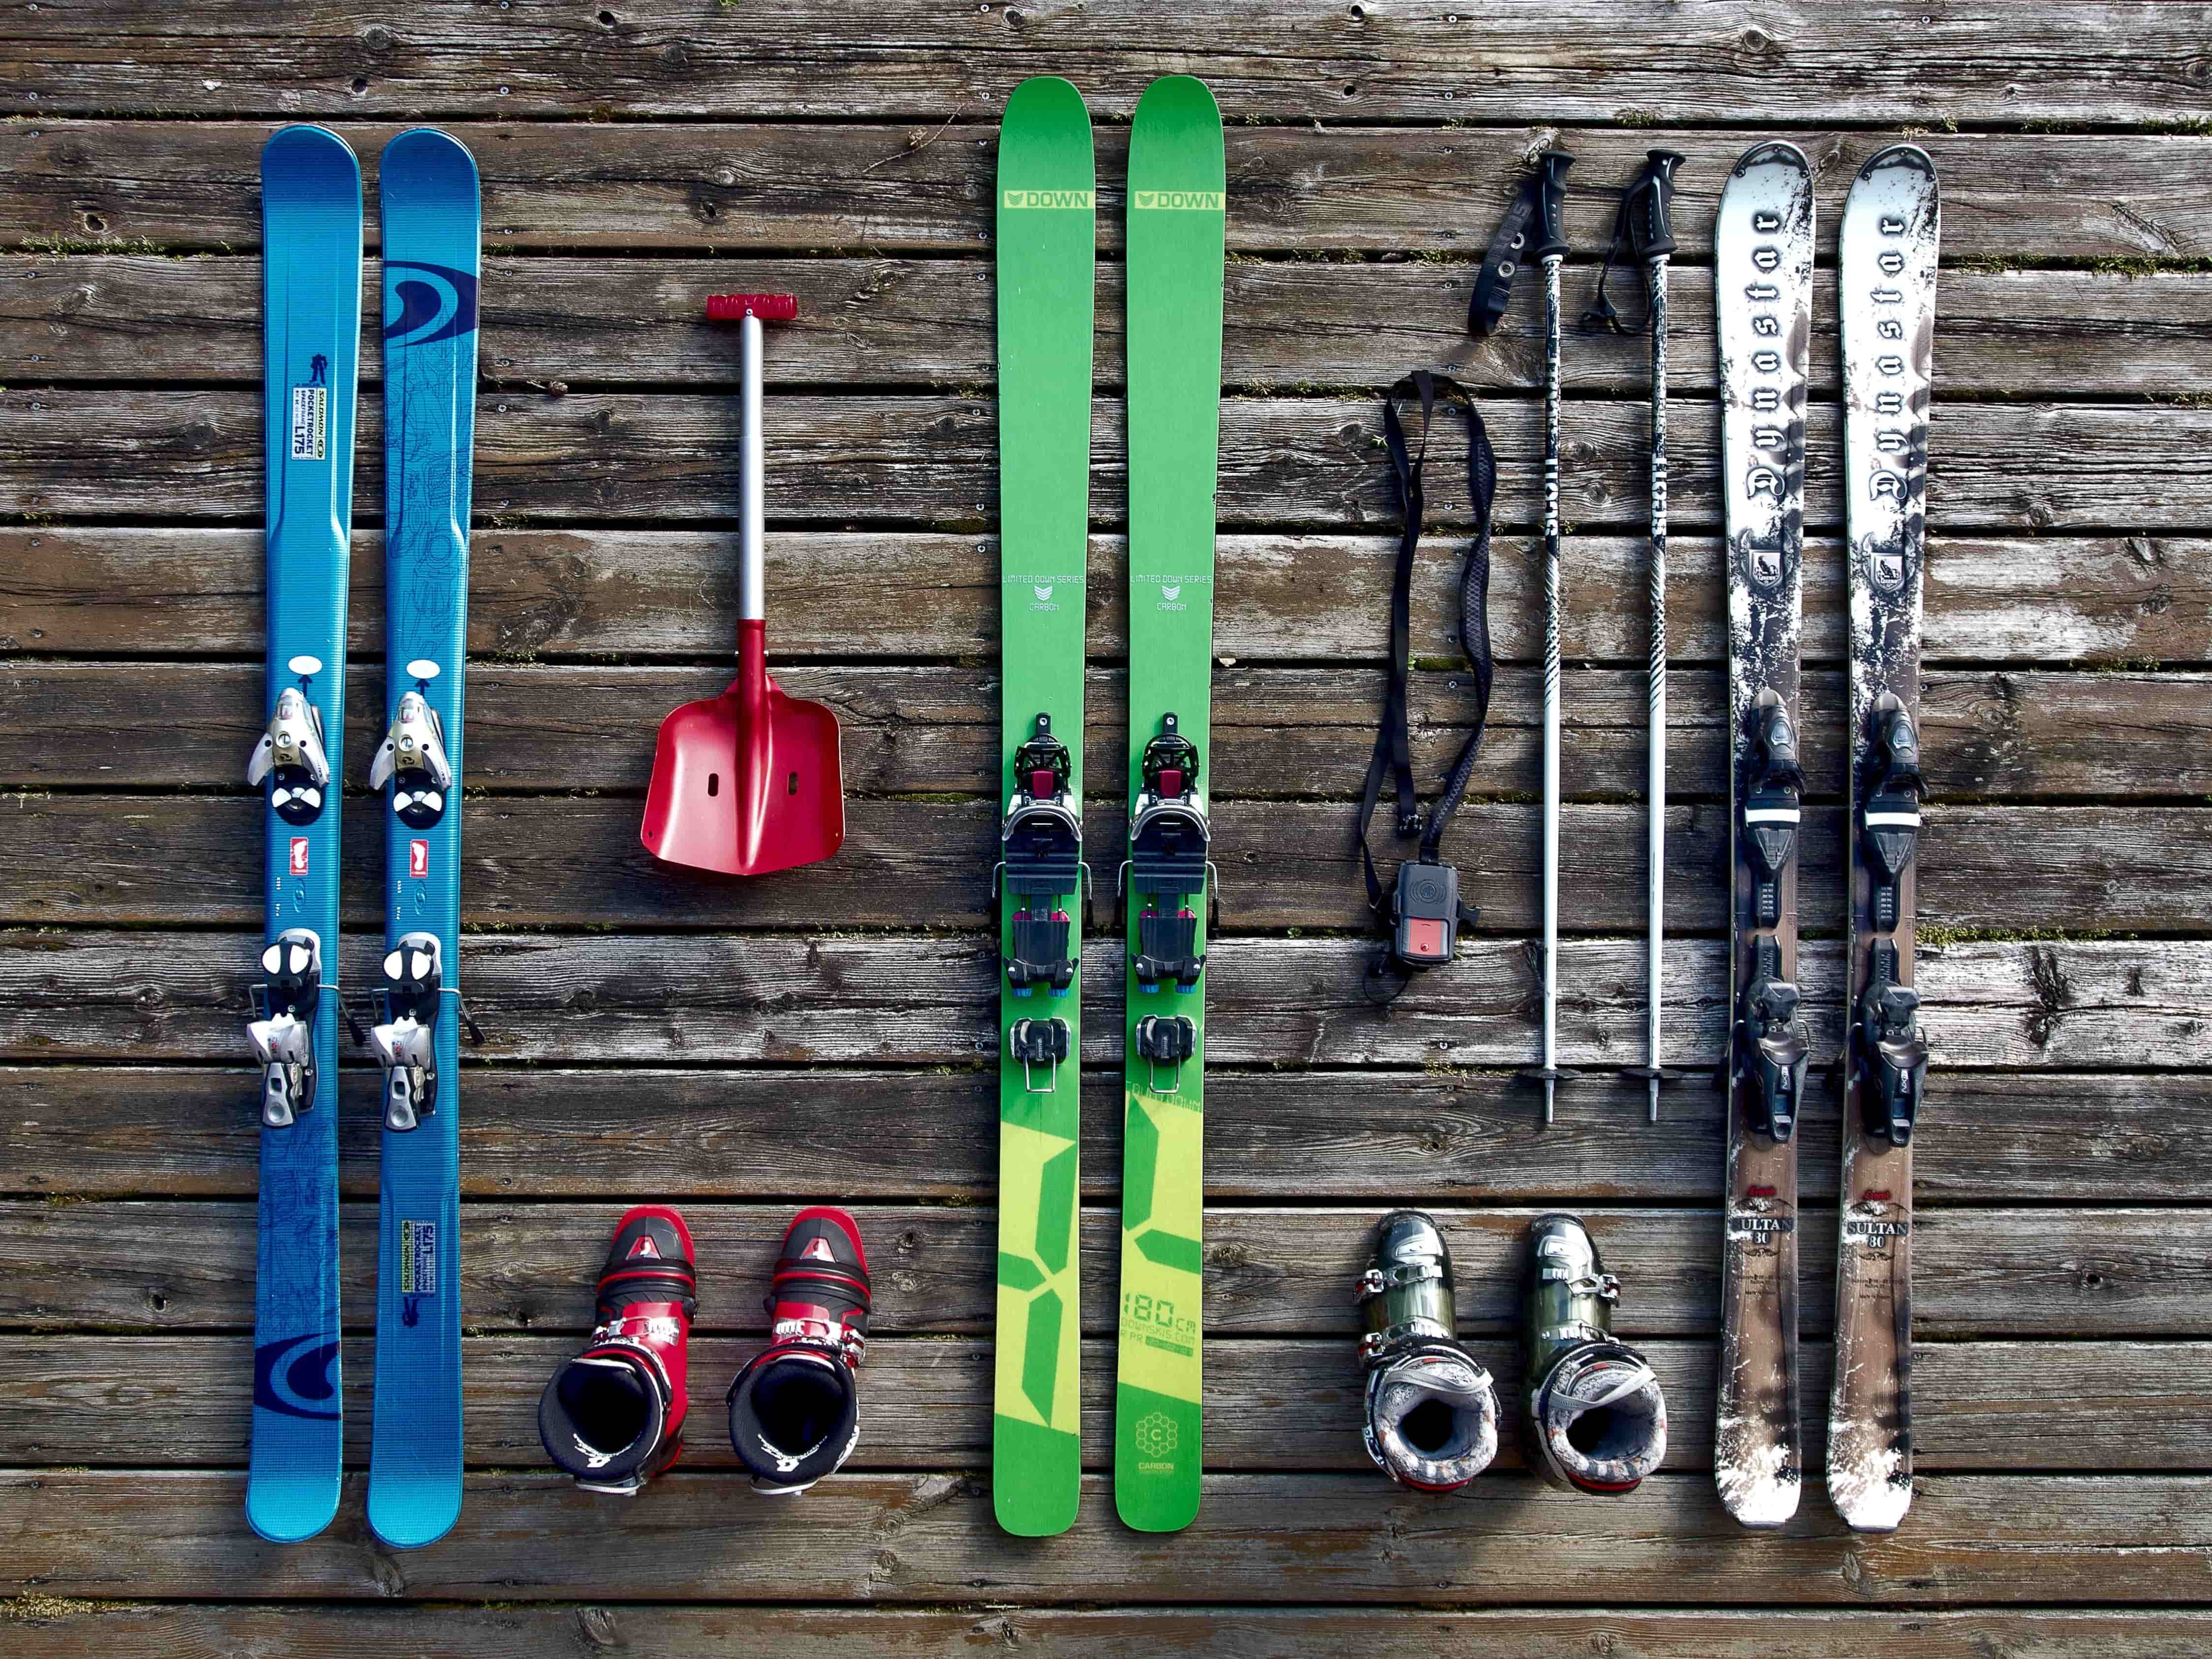 Skis, ski poles and ski boots on floor